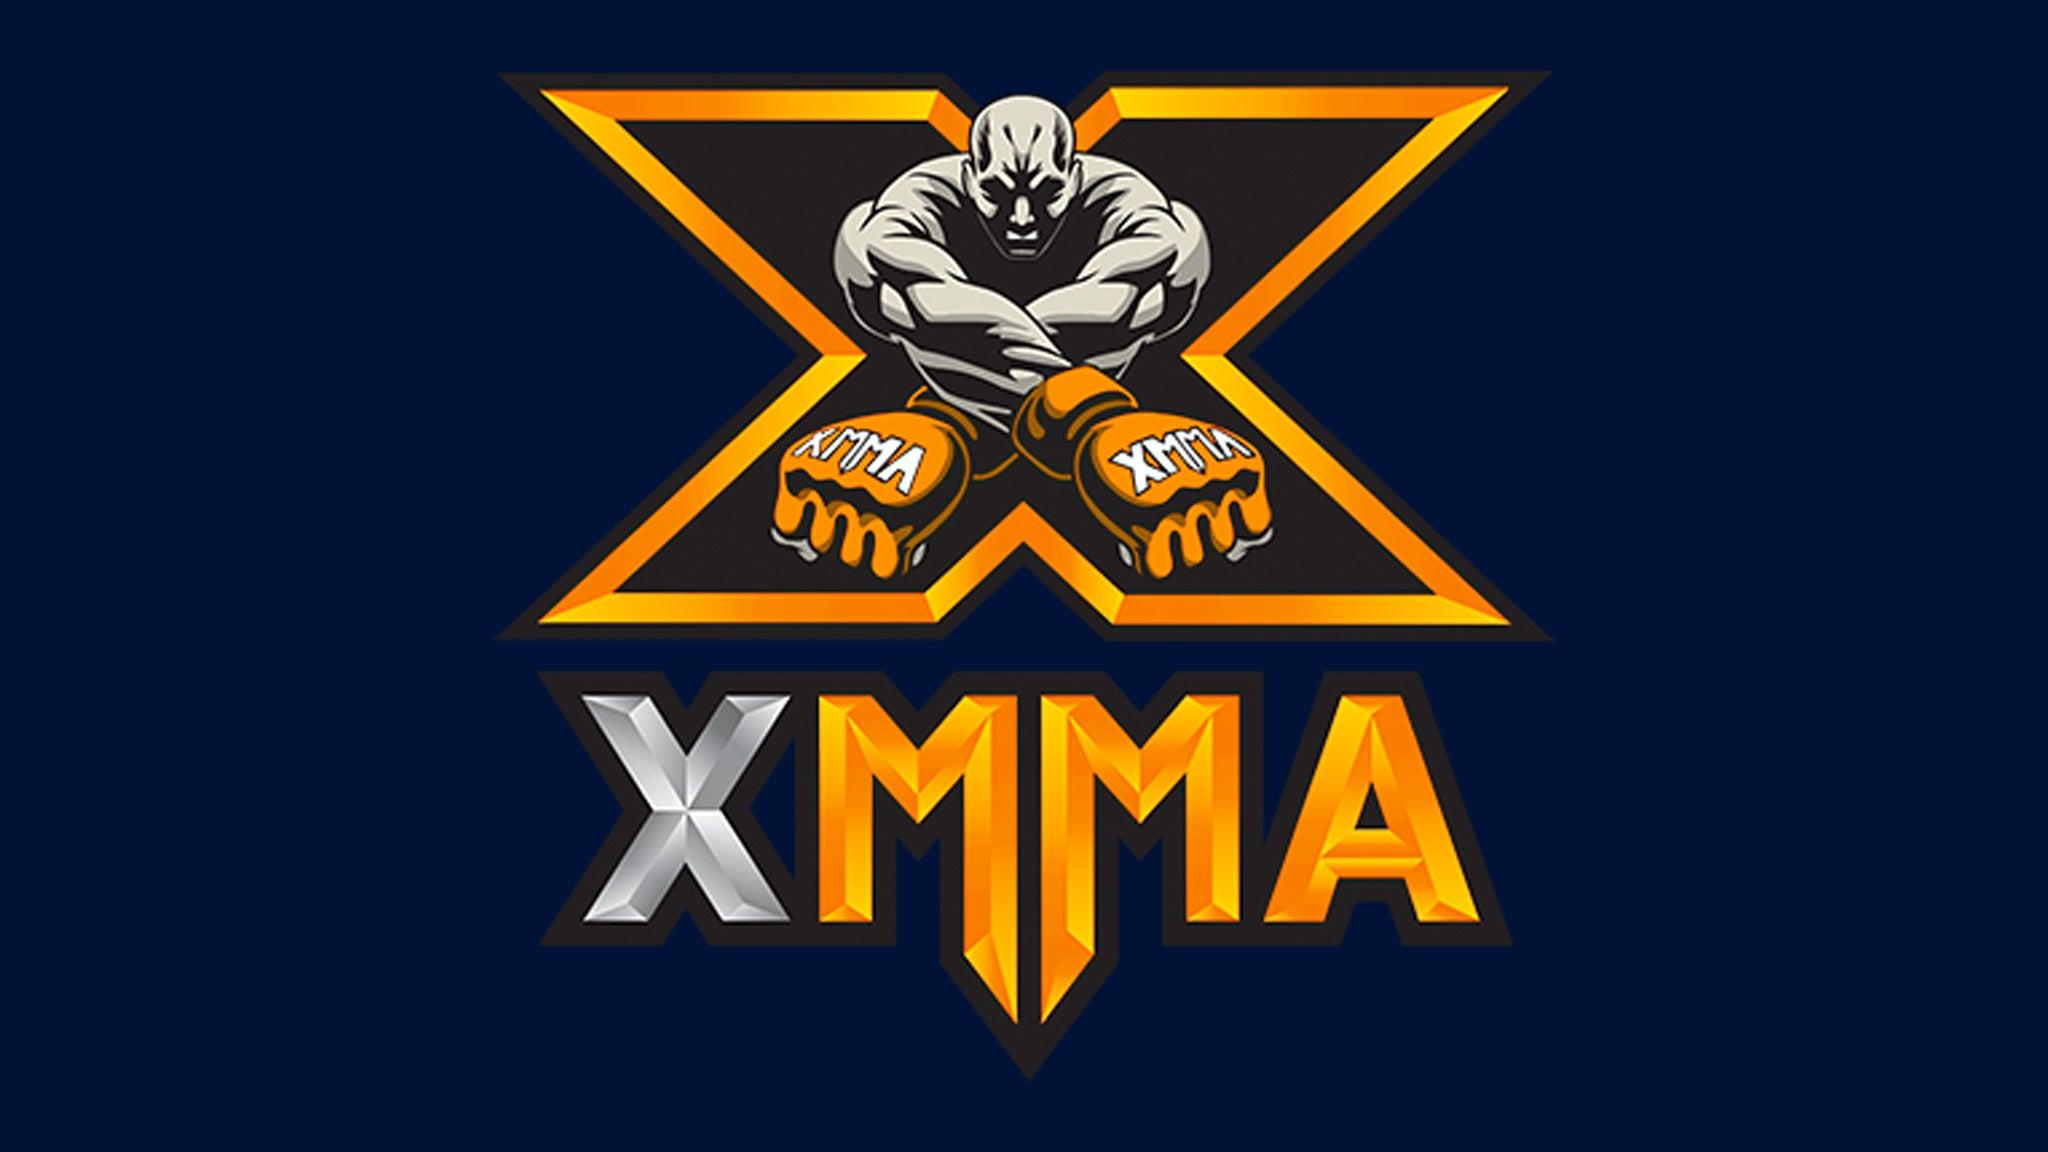 XMMA at Bon Secours Wellness Arena